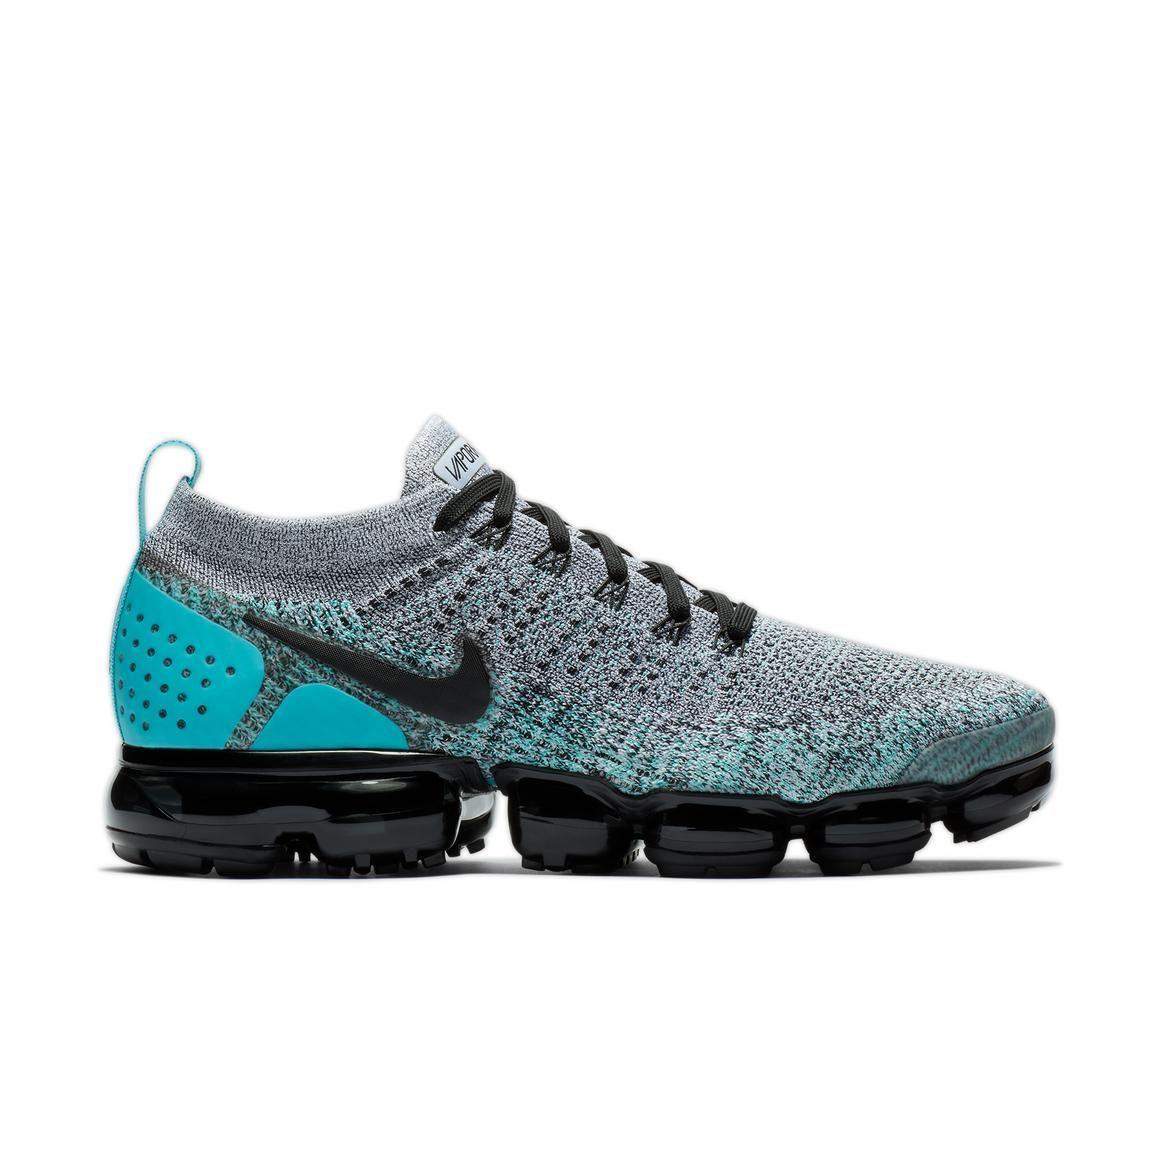 "Nike Air VaporMax Flyknit 2 ""Dusty Cactus"" Men's Running"